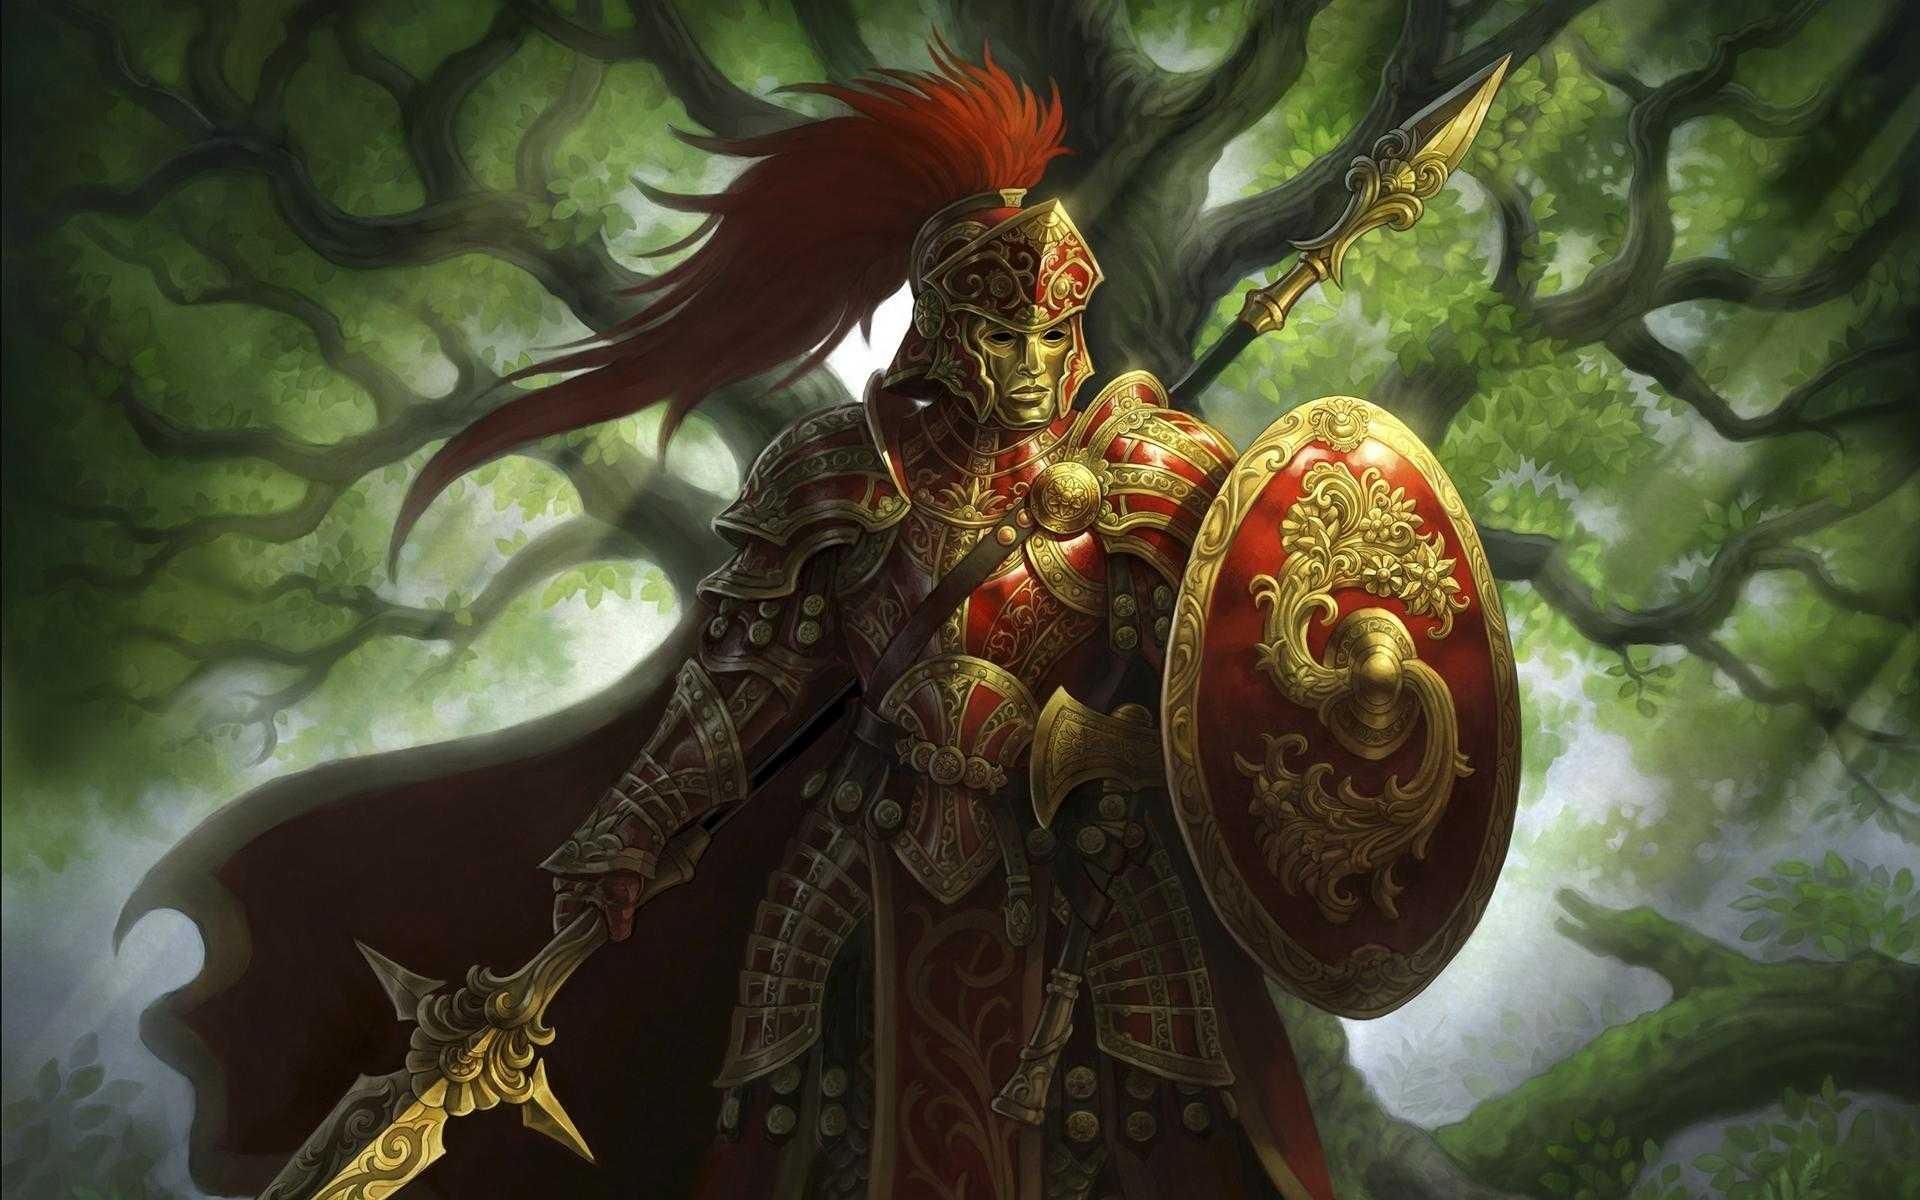 General 1920x1200 fantasy art spear armor helmet mask shield trees